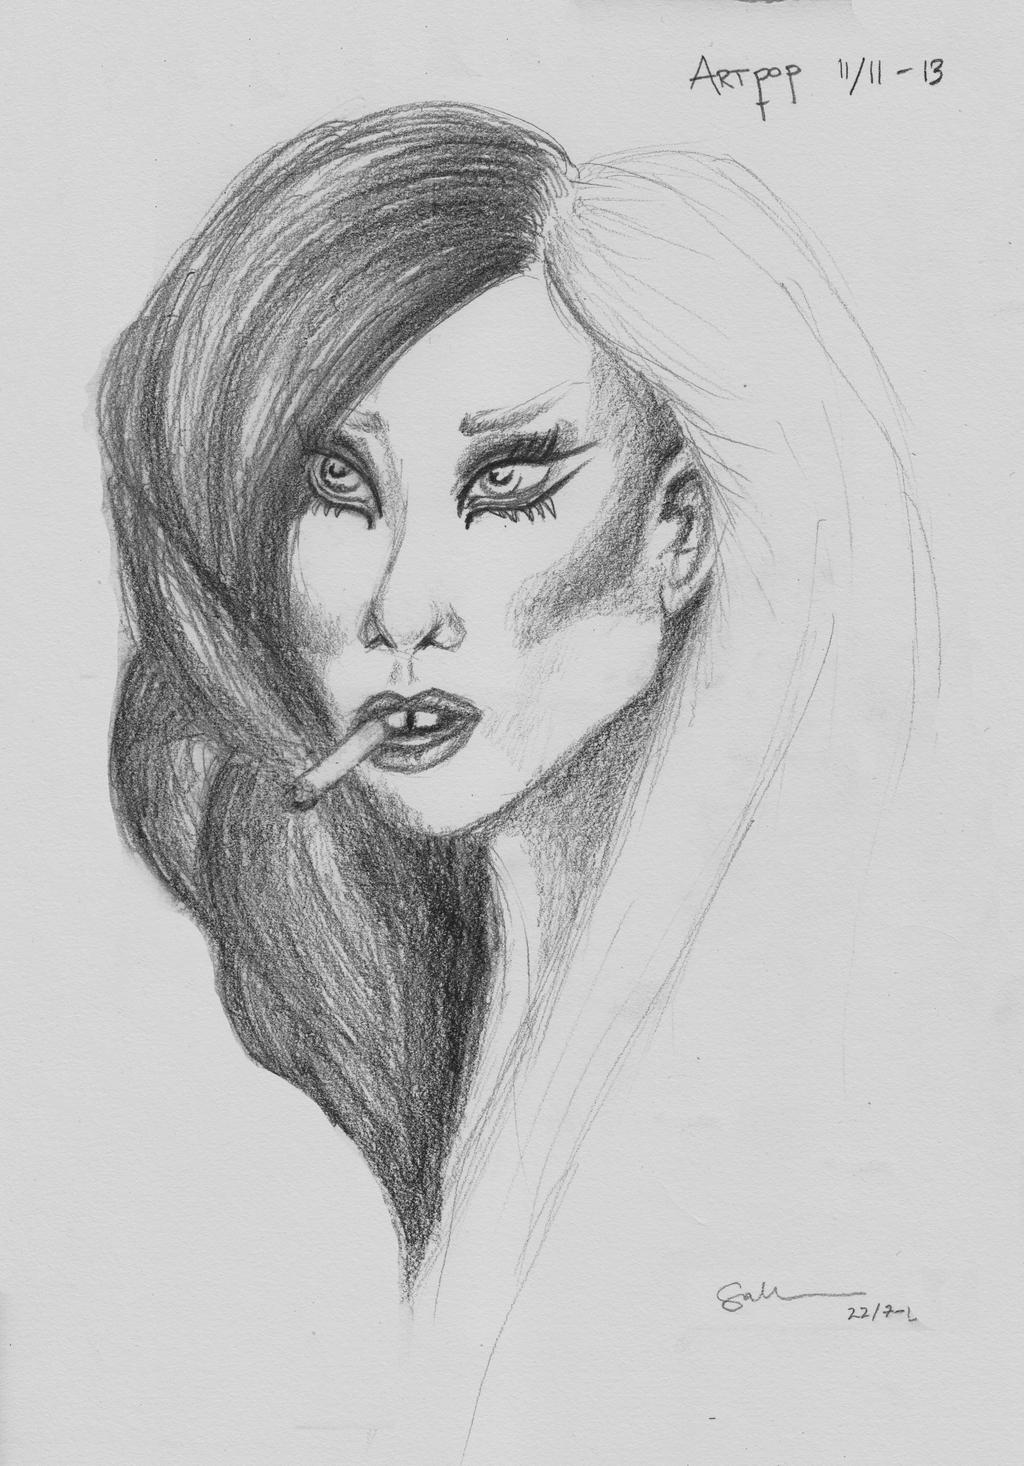 Lady Gaga - ArtPop by Salooverall on deviantART